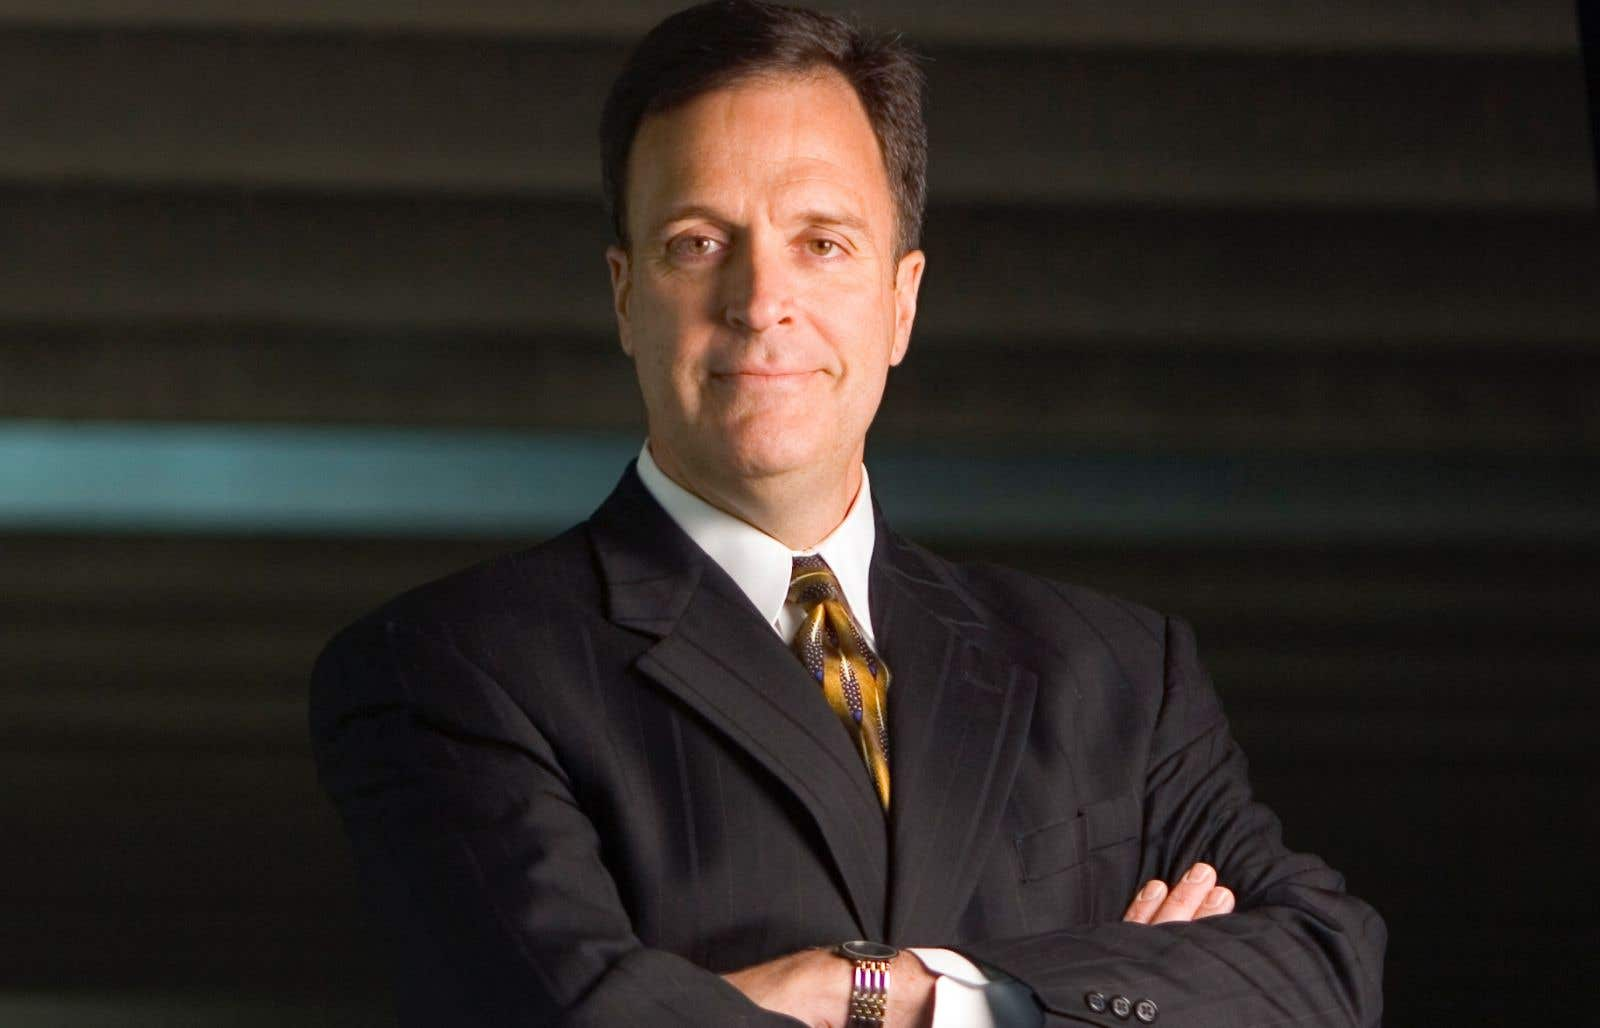 Mark Sanborn, Leadership Development Expert & Best Selling Author